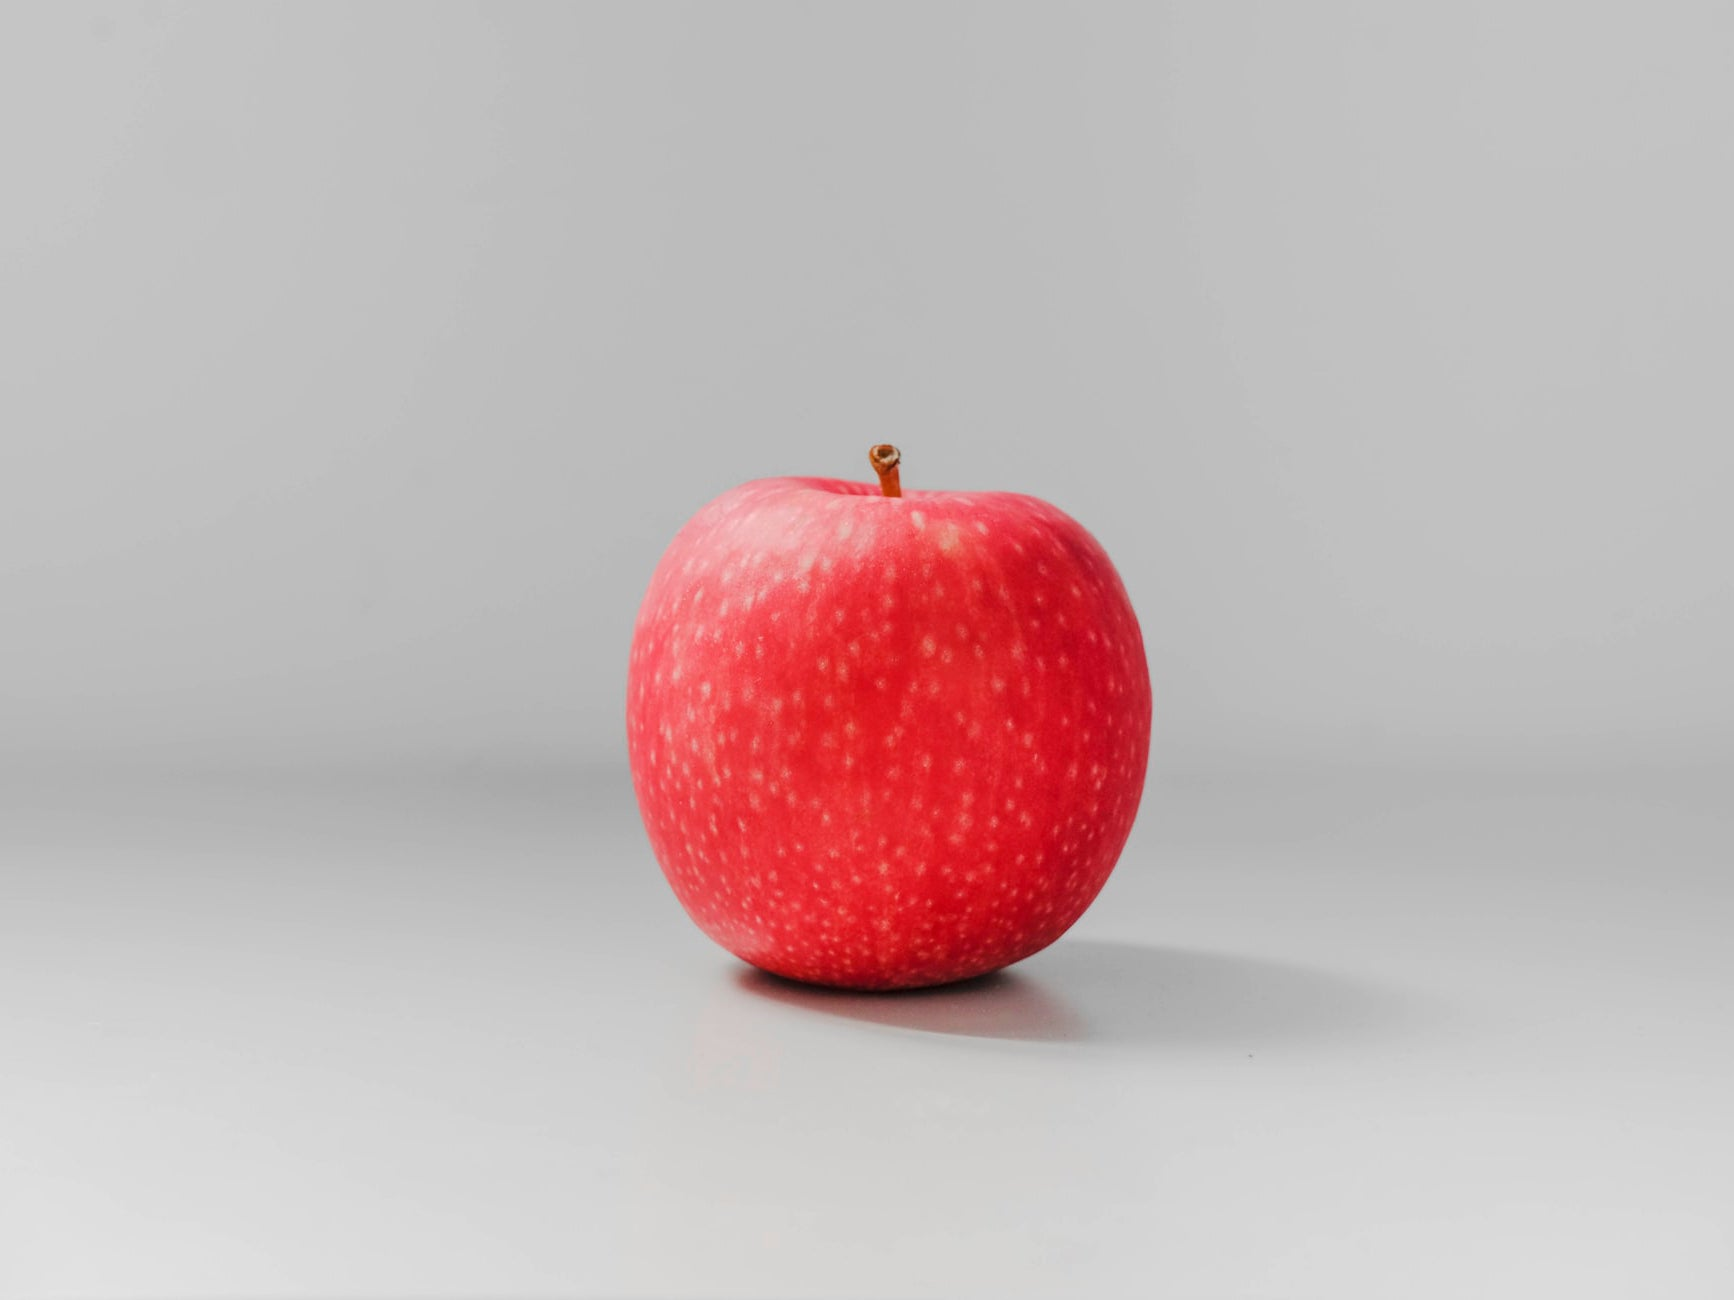 Single apple grey background